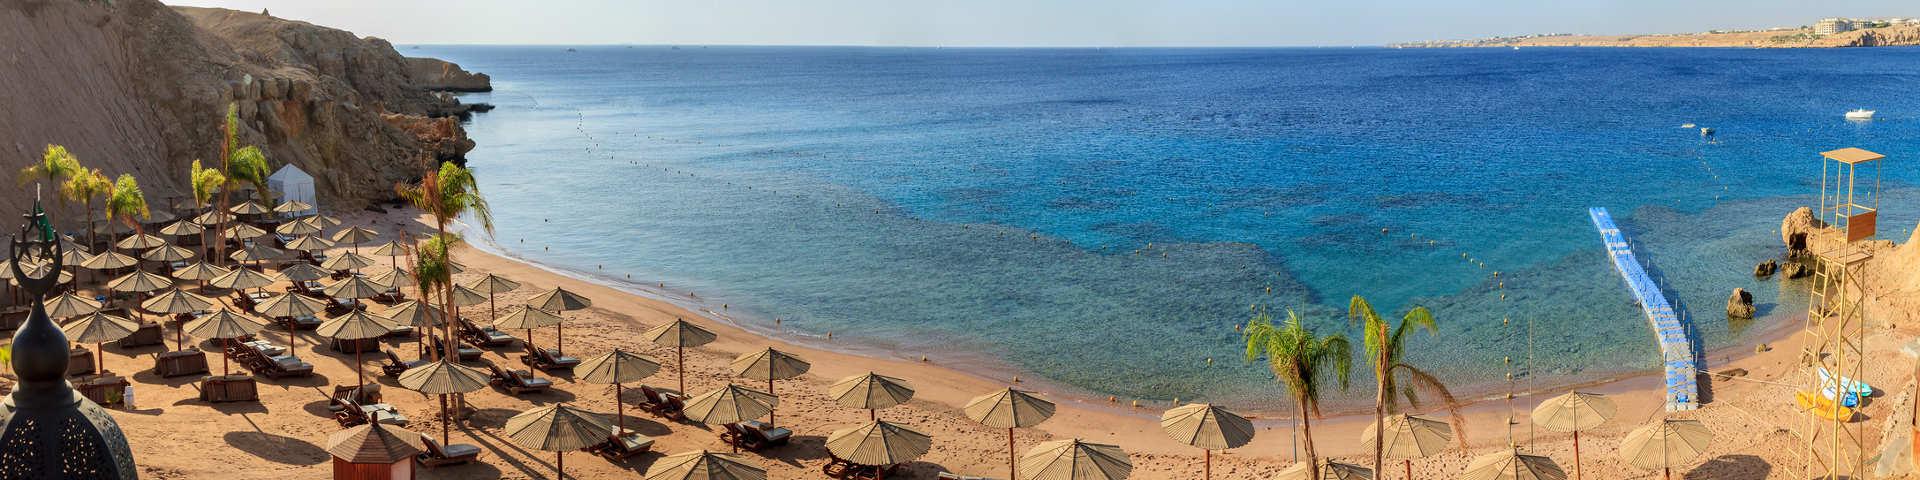 Sharm el sheikh hero1